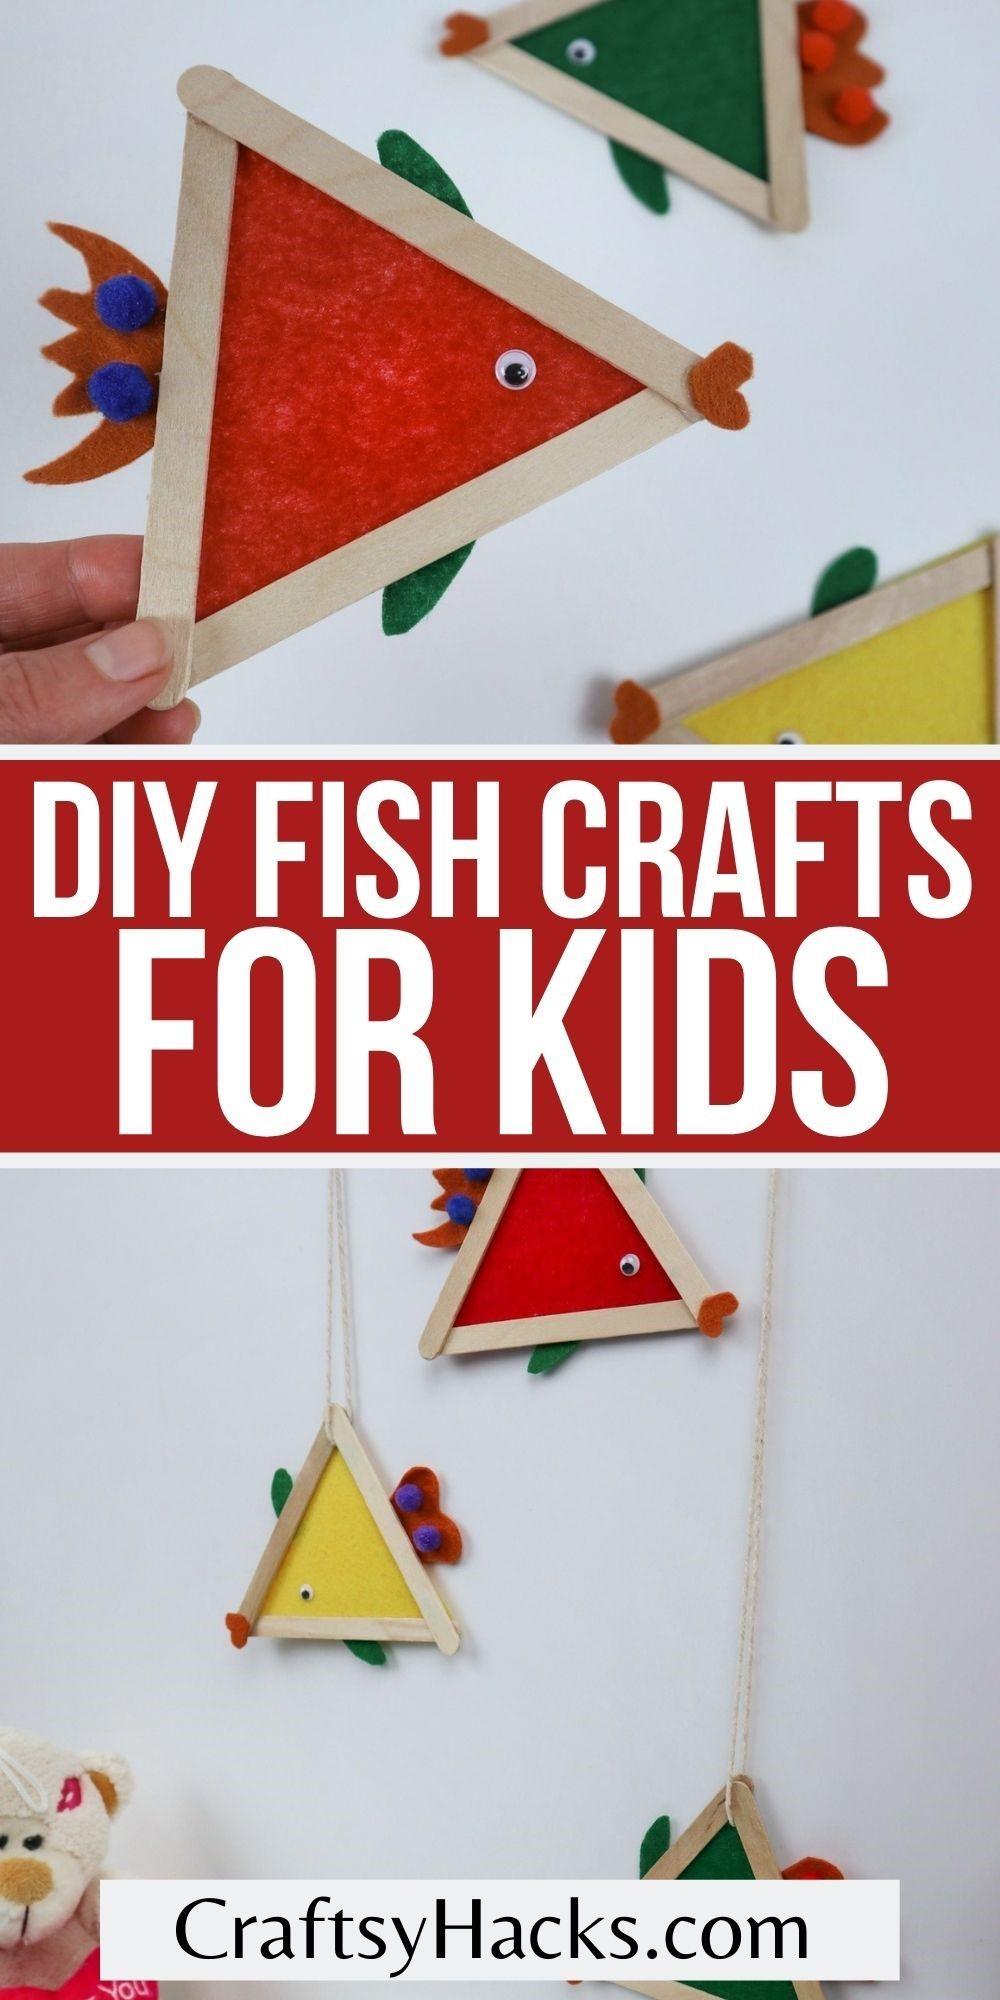 diy fish crafts for kids pin